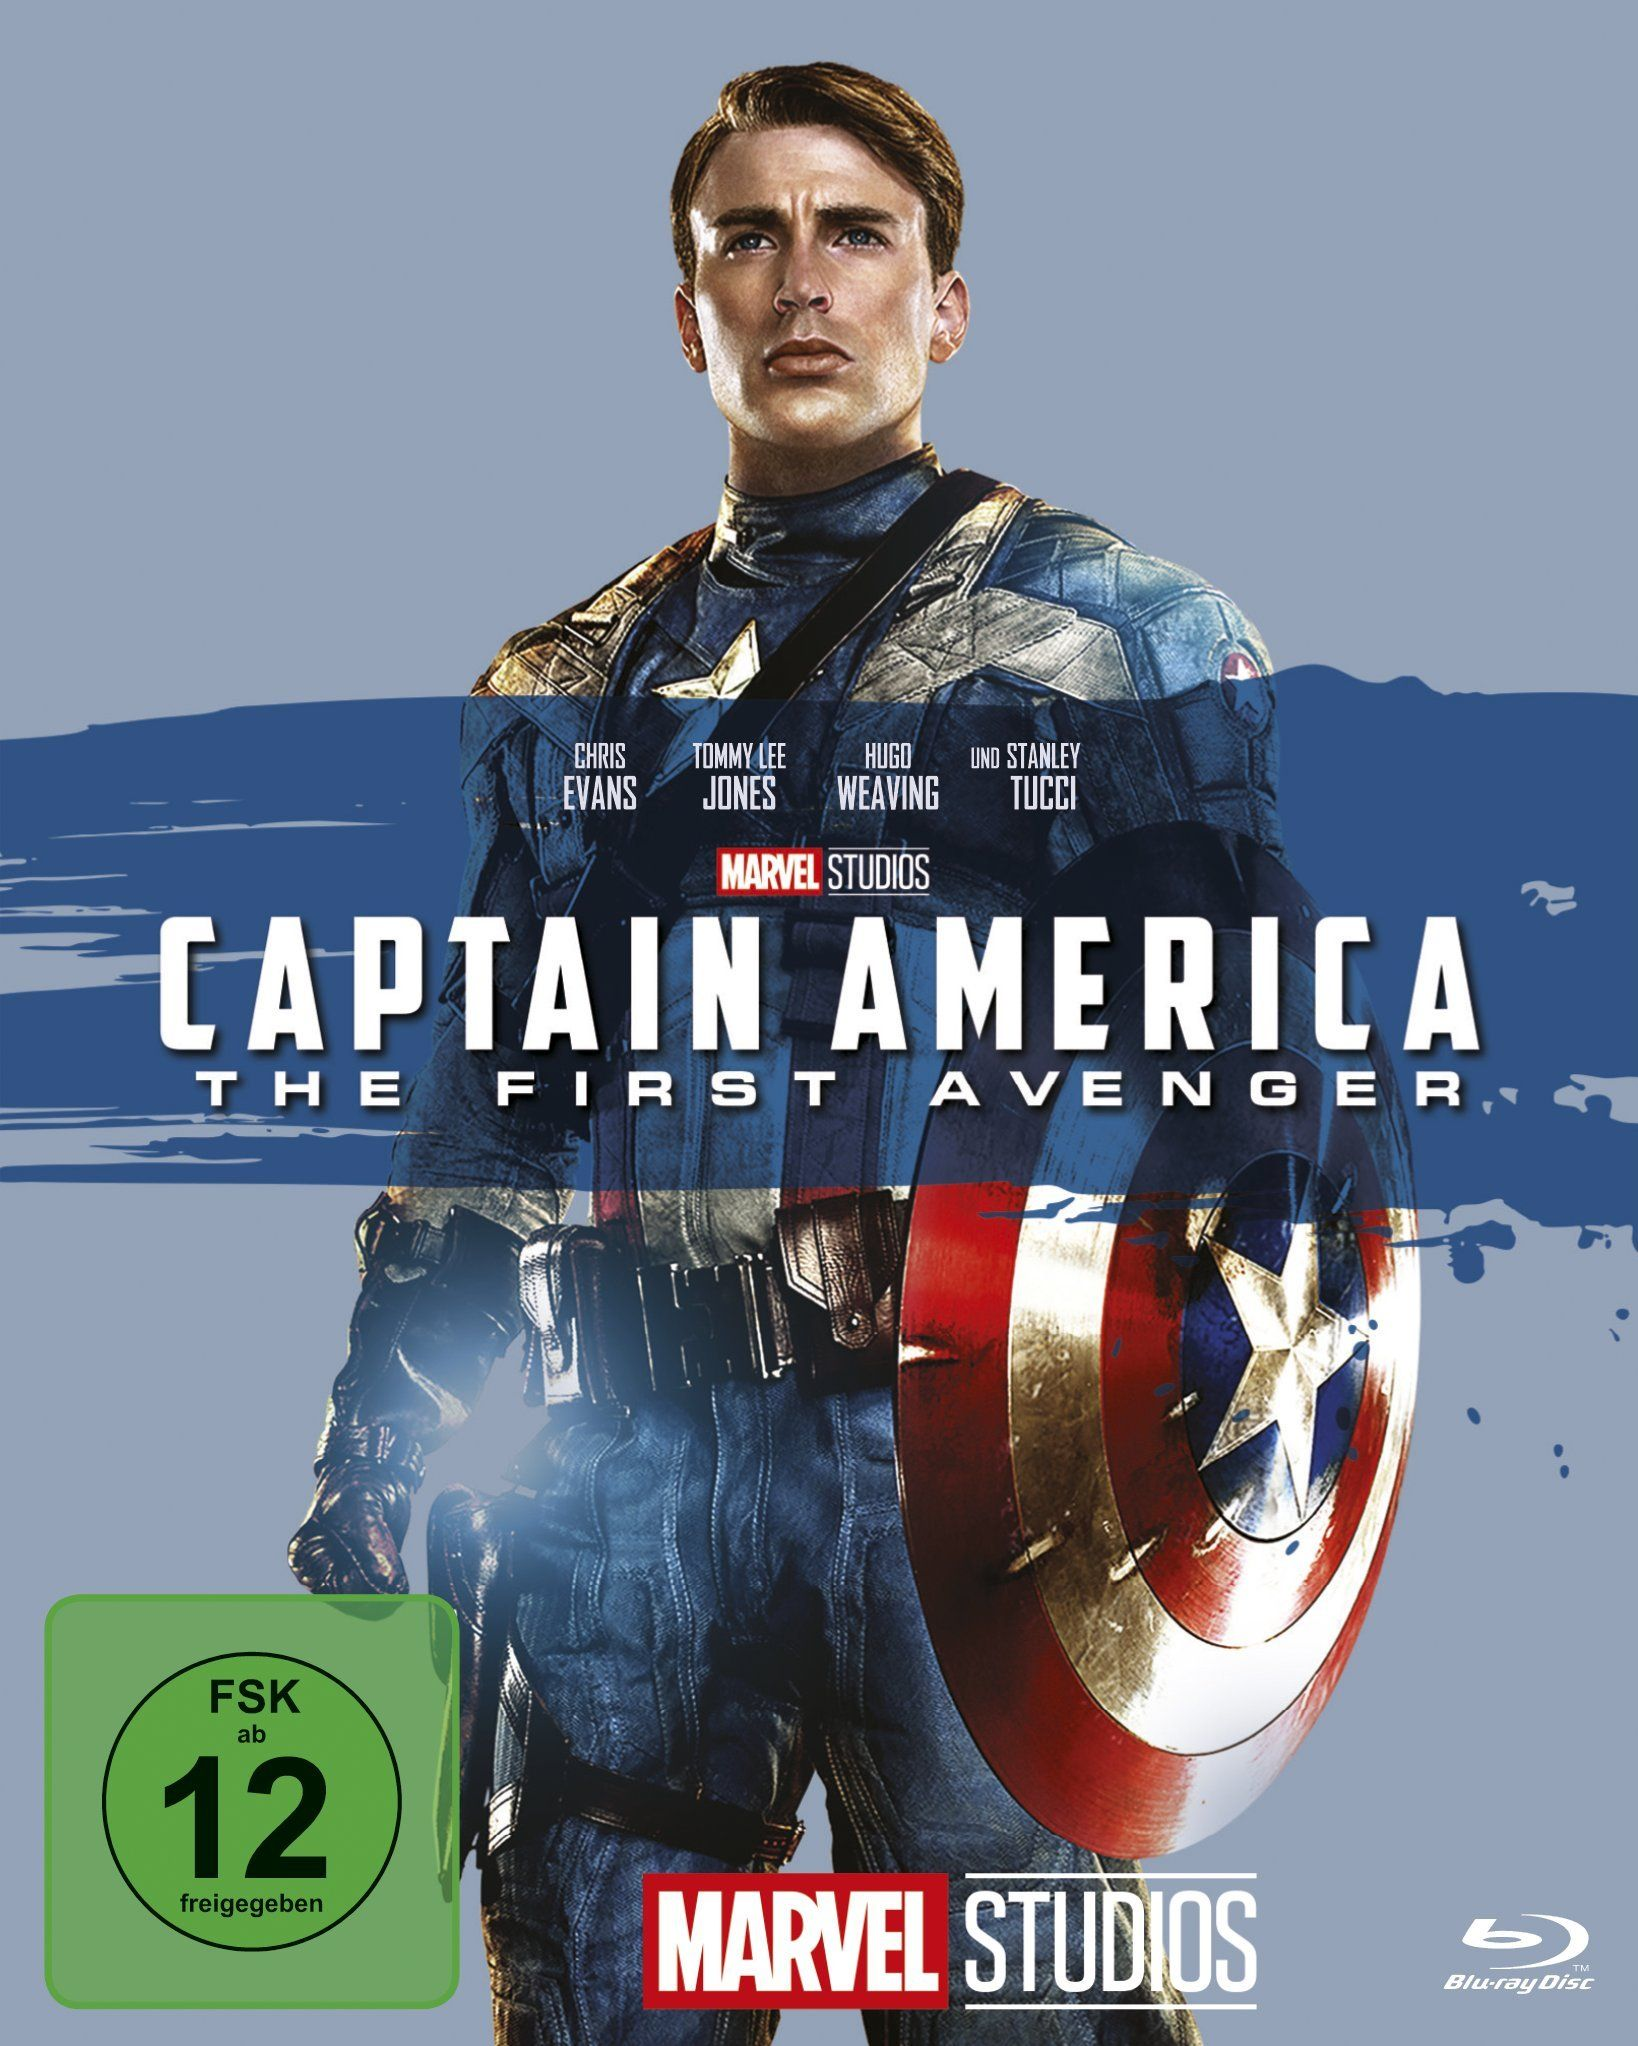 Captain America The First Avenger Alemania Blu Ray Avenger America Captain Ray Peliculas Marvel Peliculas Completas Capitan America